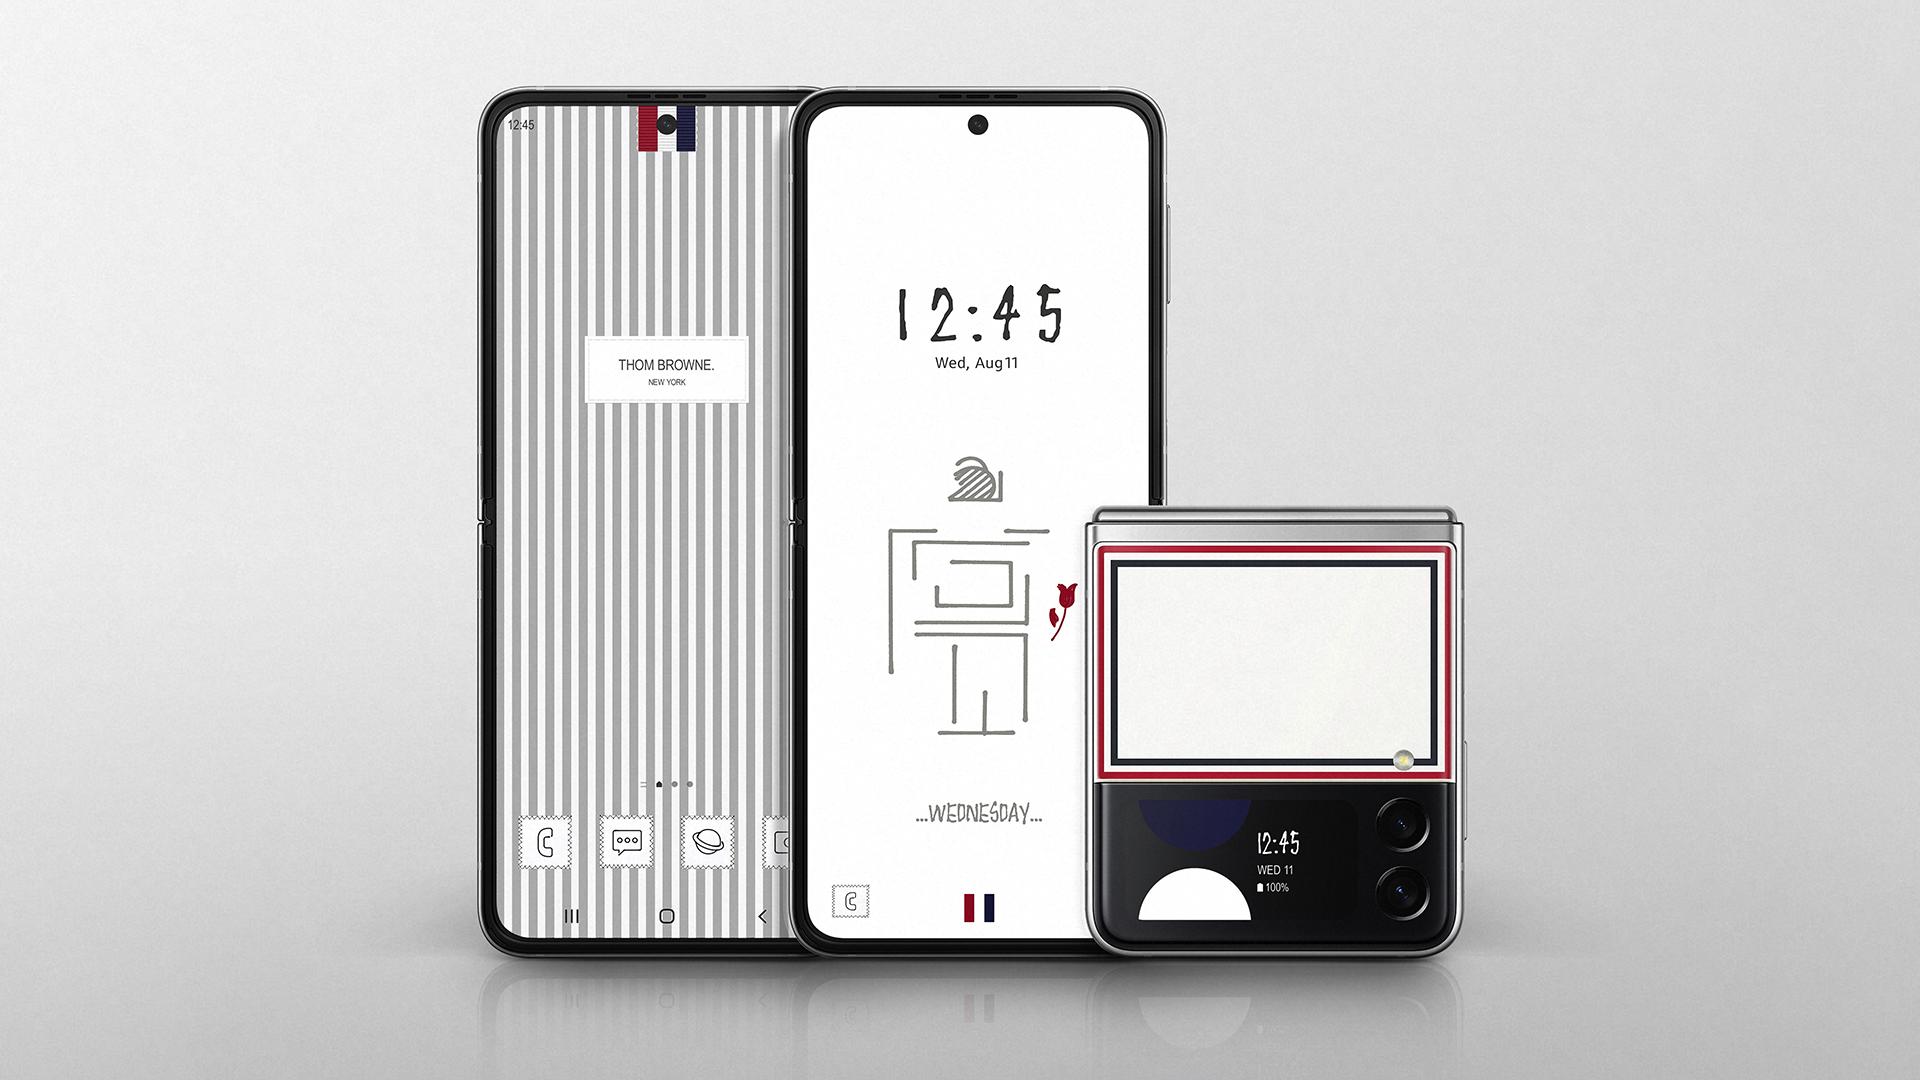 Thom Browne version of the Samsung Galaxy Flip3.